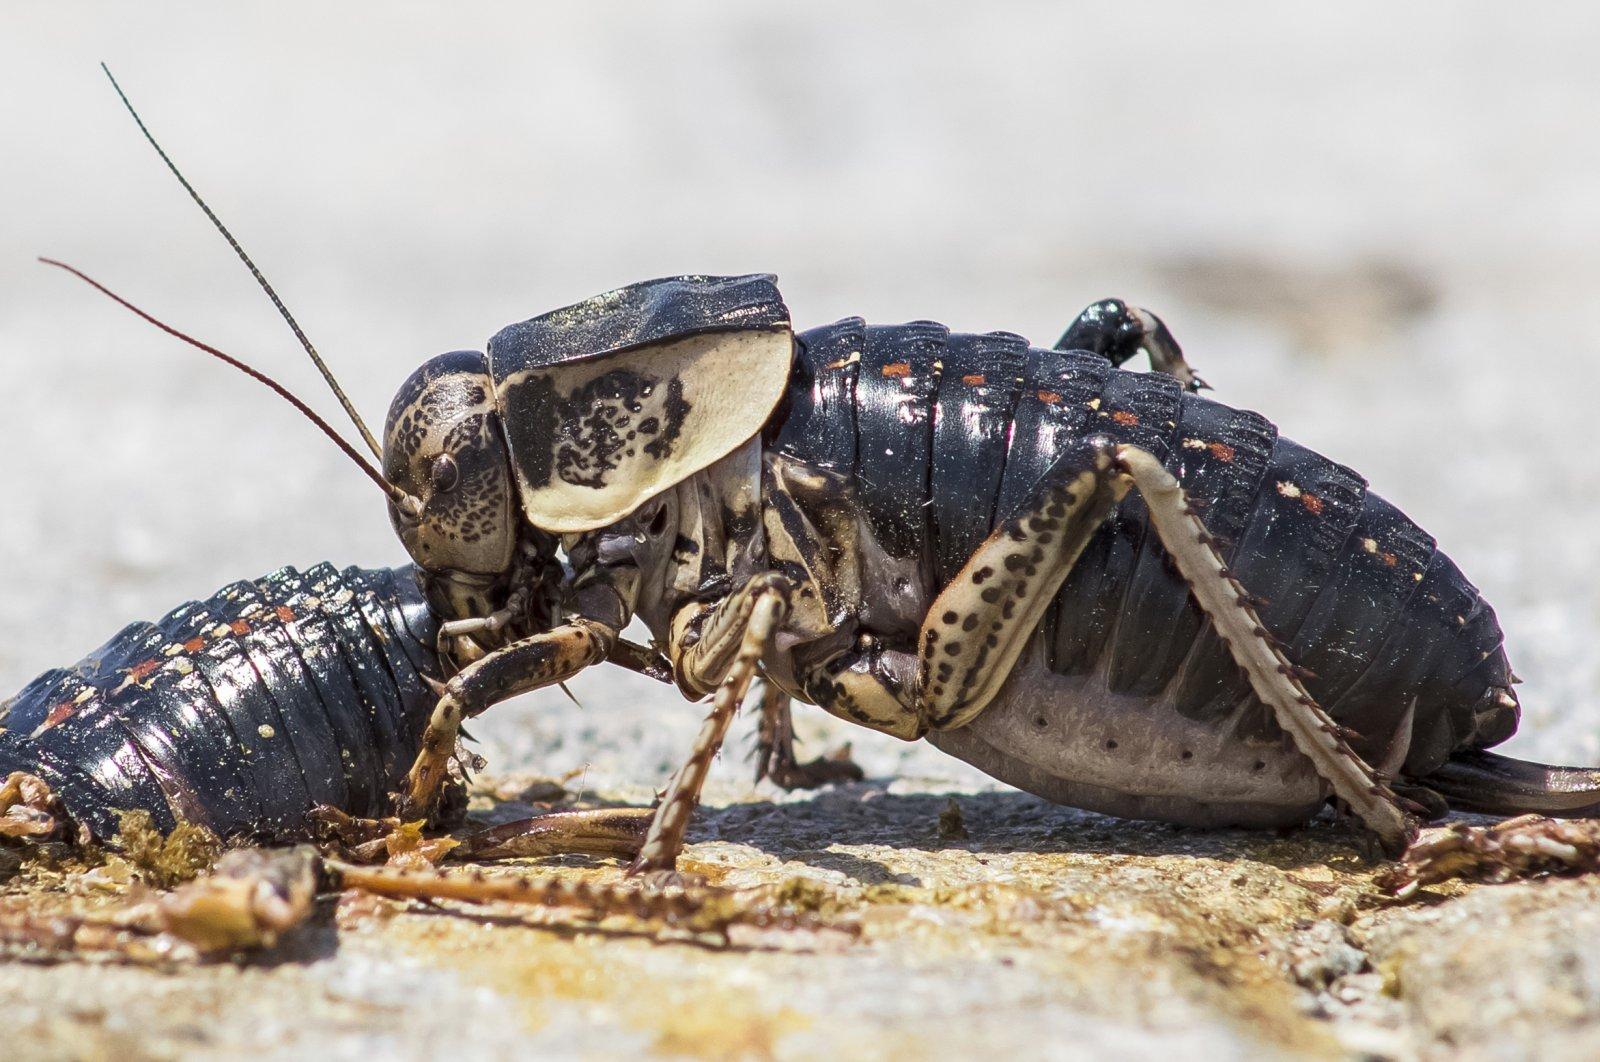 A female Bradyporus karabagi eats a male of her own species alive, near Karacadağ dormant volcano, Diyarbakır, Turkey, June 1, 2020. (DHA Photo)